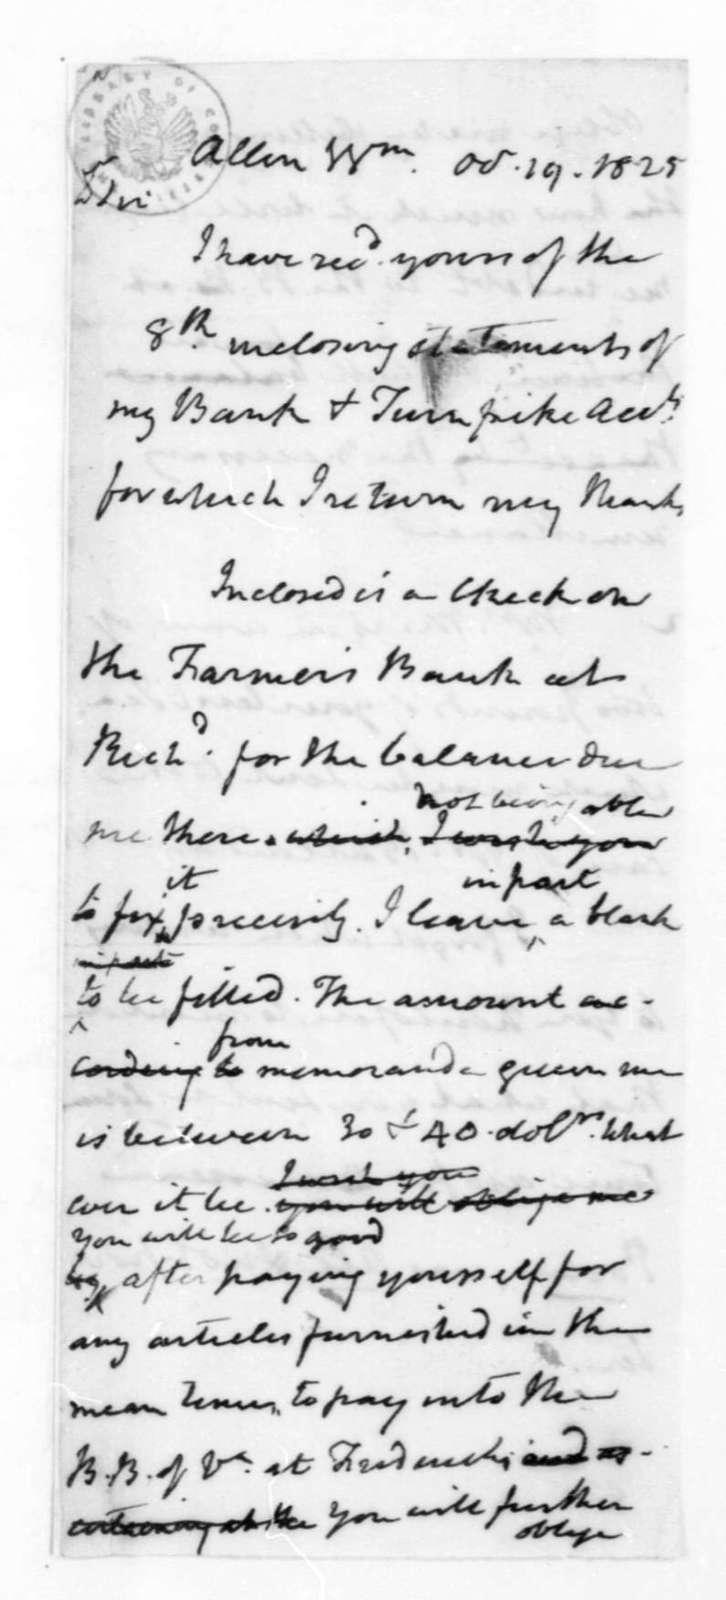 James Madison to William Allen, October 19, 1825.